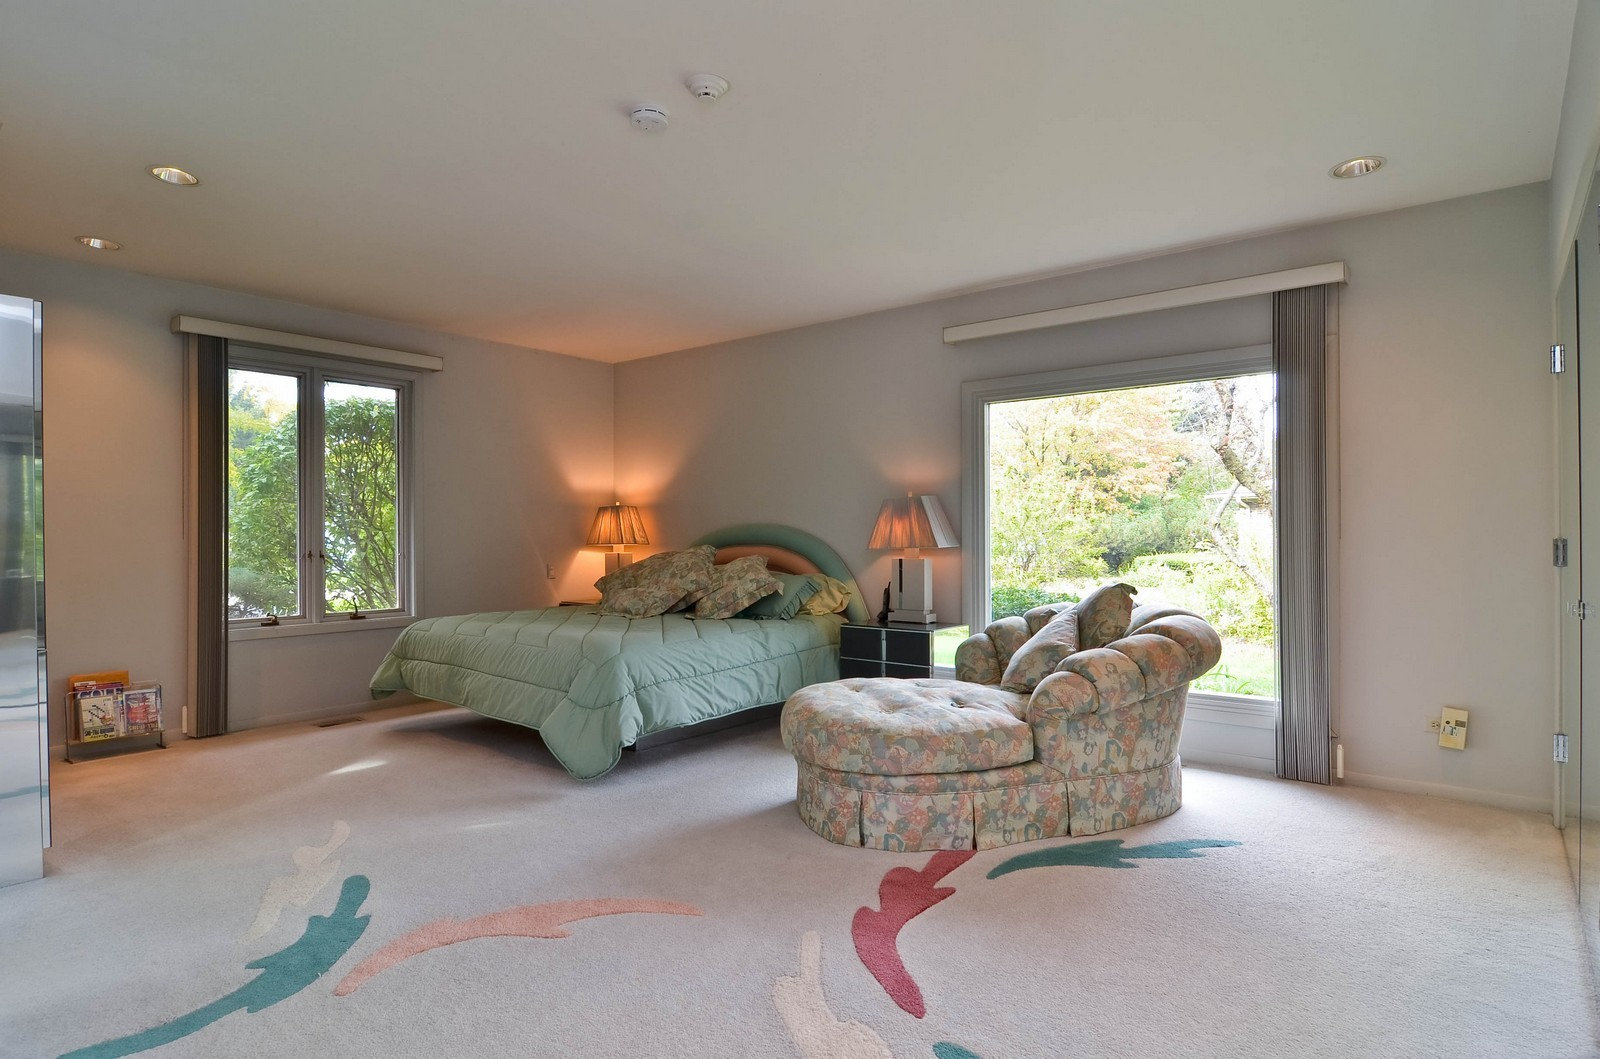 Real Estate Photography - 2265 Cedar, Northbrook, IL, 60062 - Master Bedroom